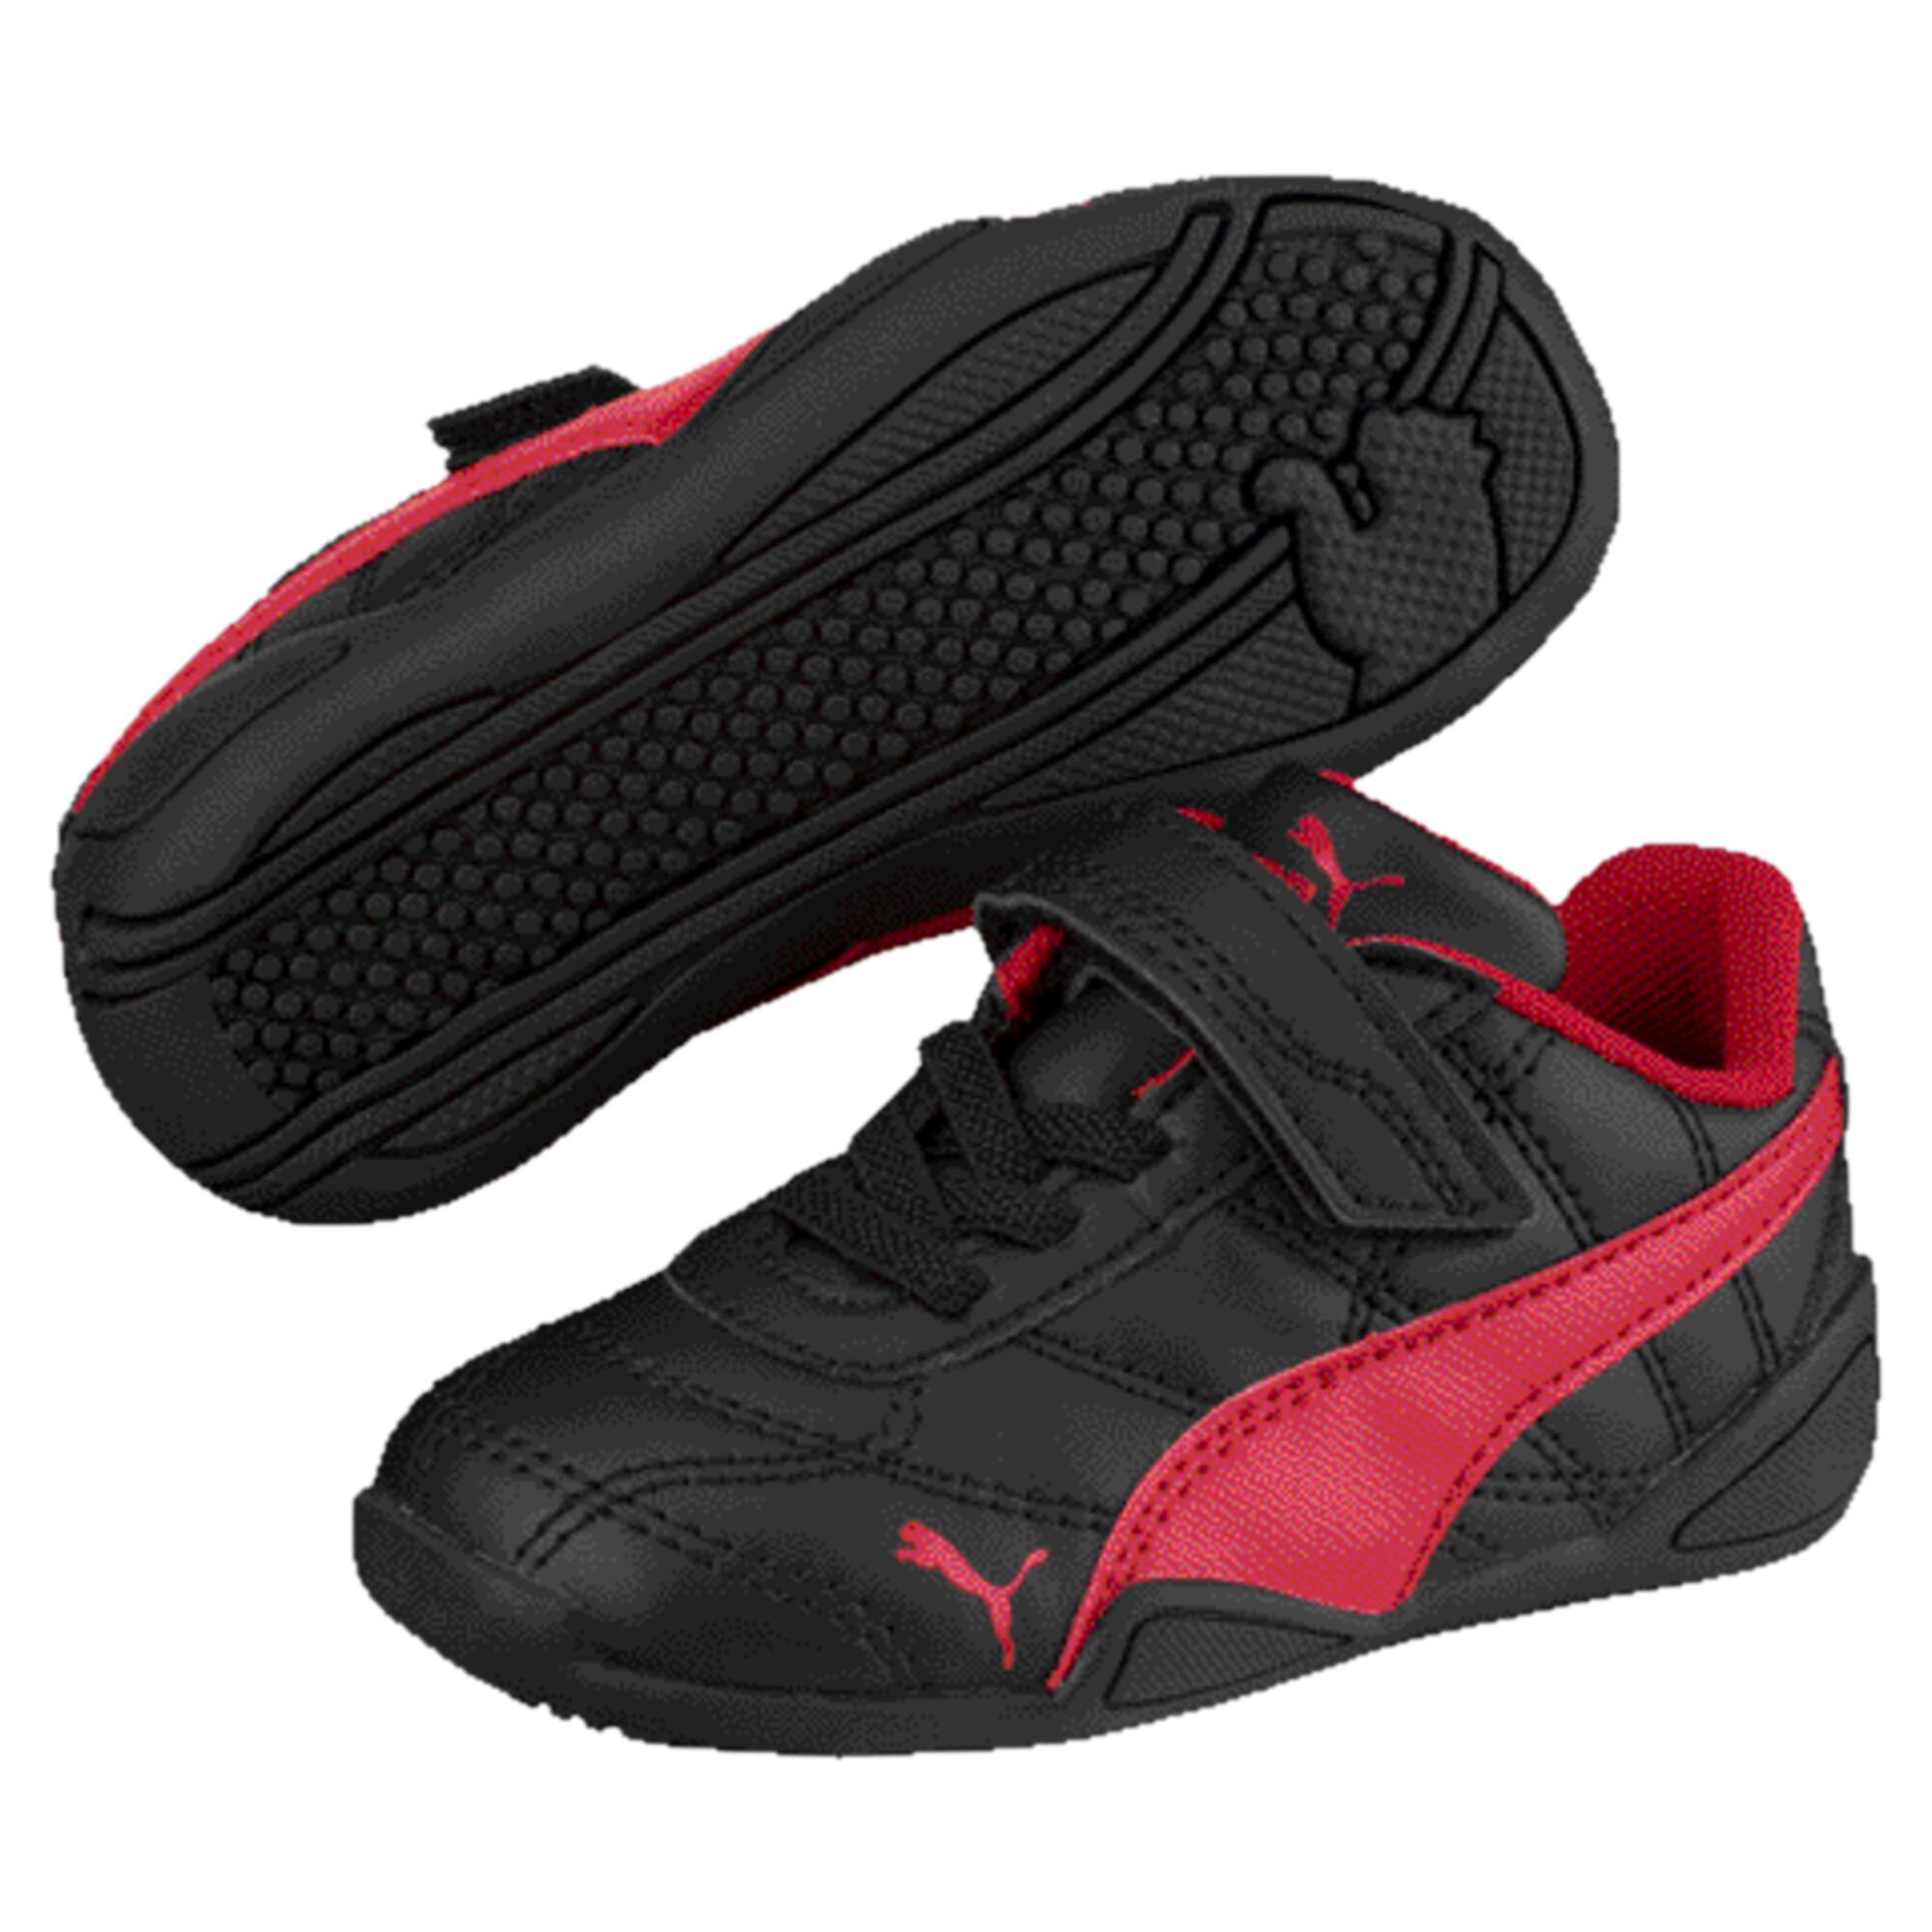 PUMA-Tune-Cat-3-AC-Toddler-Shoes-Kids-Shoe-Kids thumbnail 21